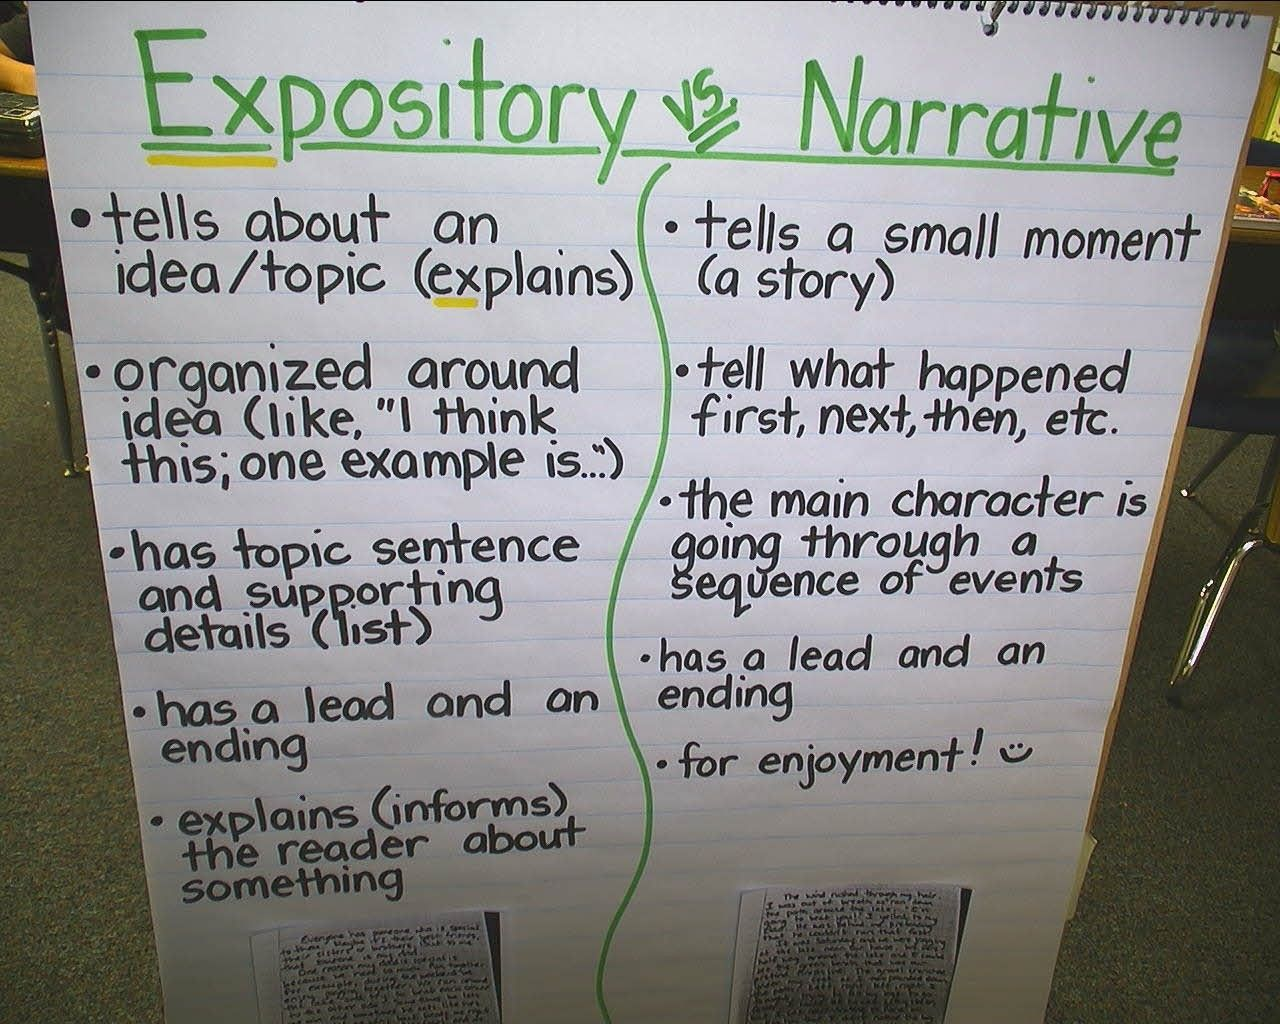 Narrative Vs Expository Text Narrative Vs Expository